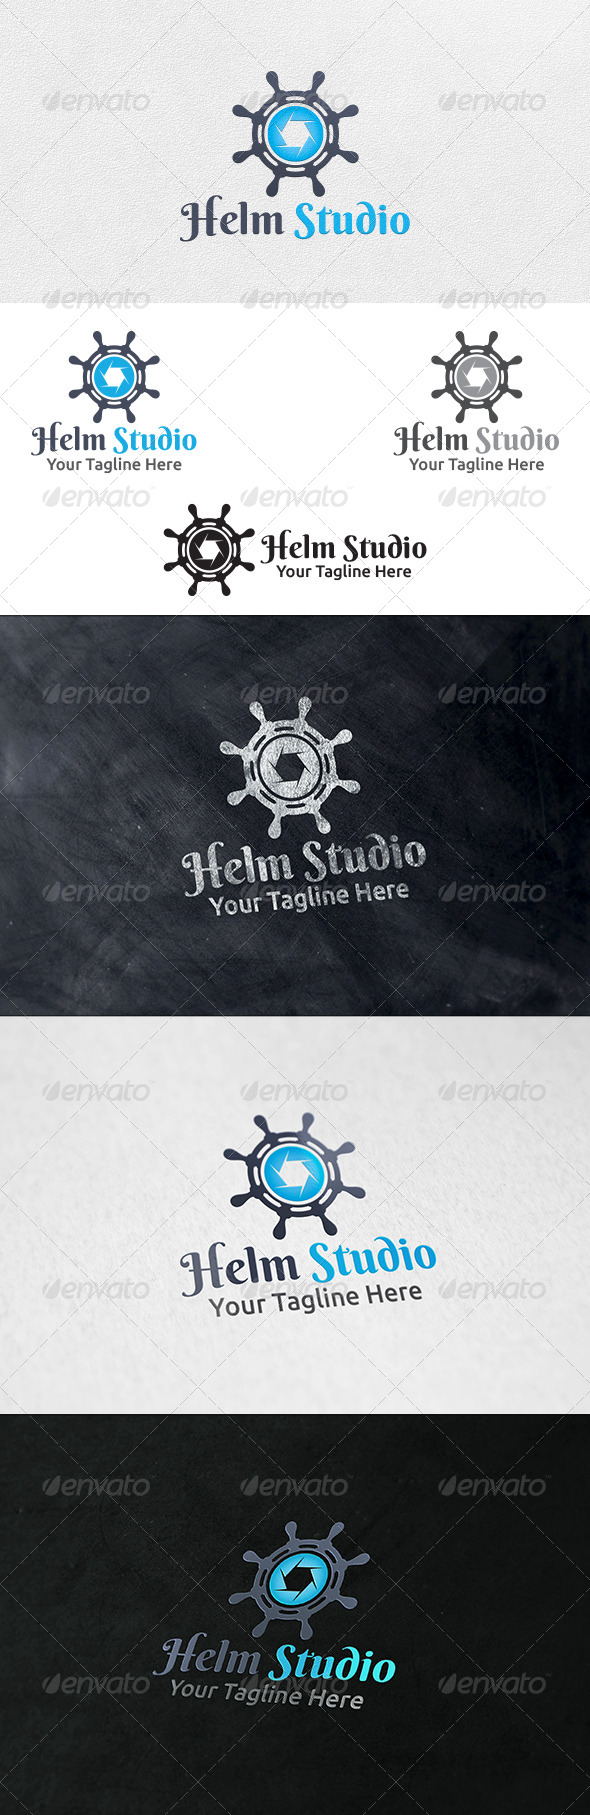 Helm Studio - Logo Template - Symbols Logo Templates